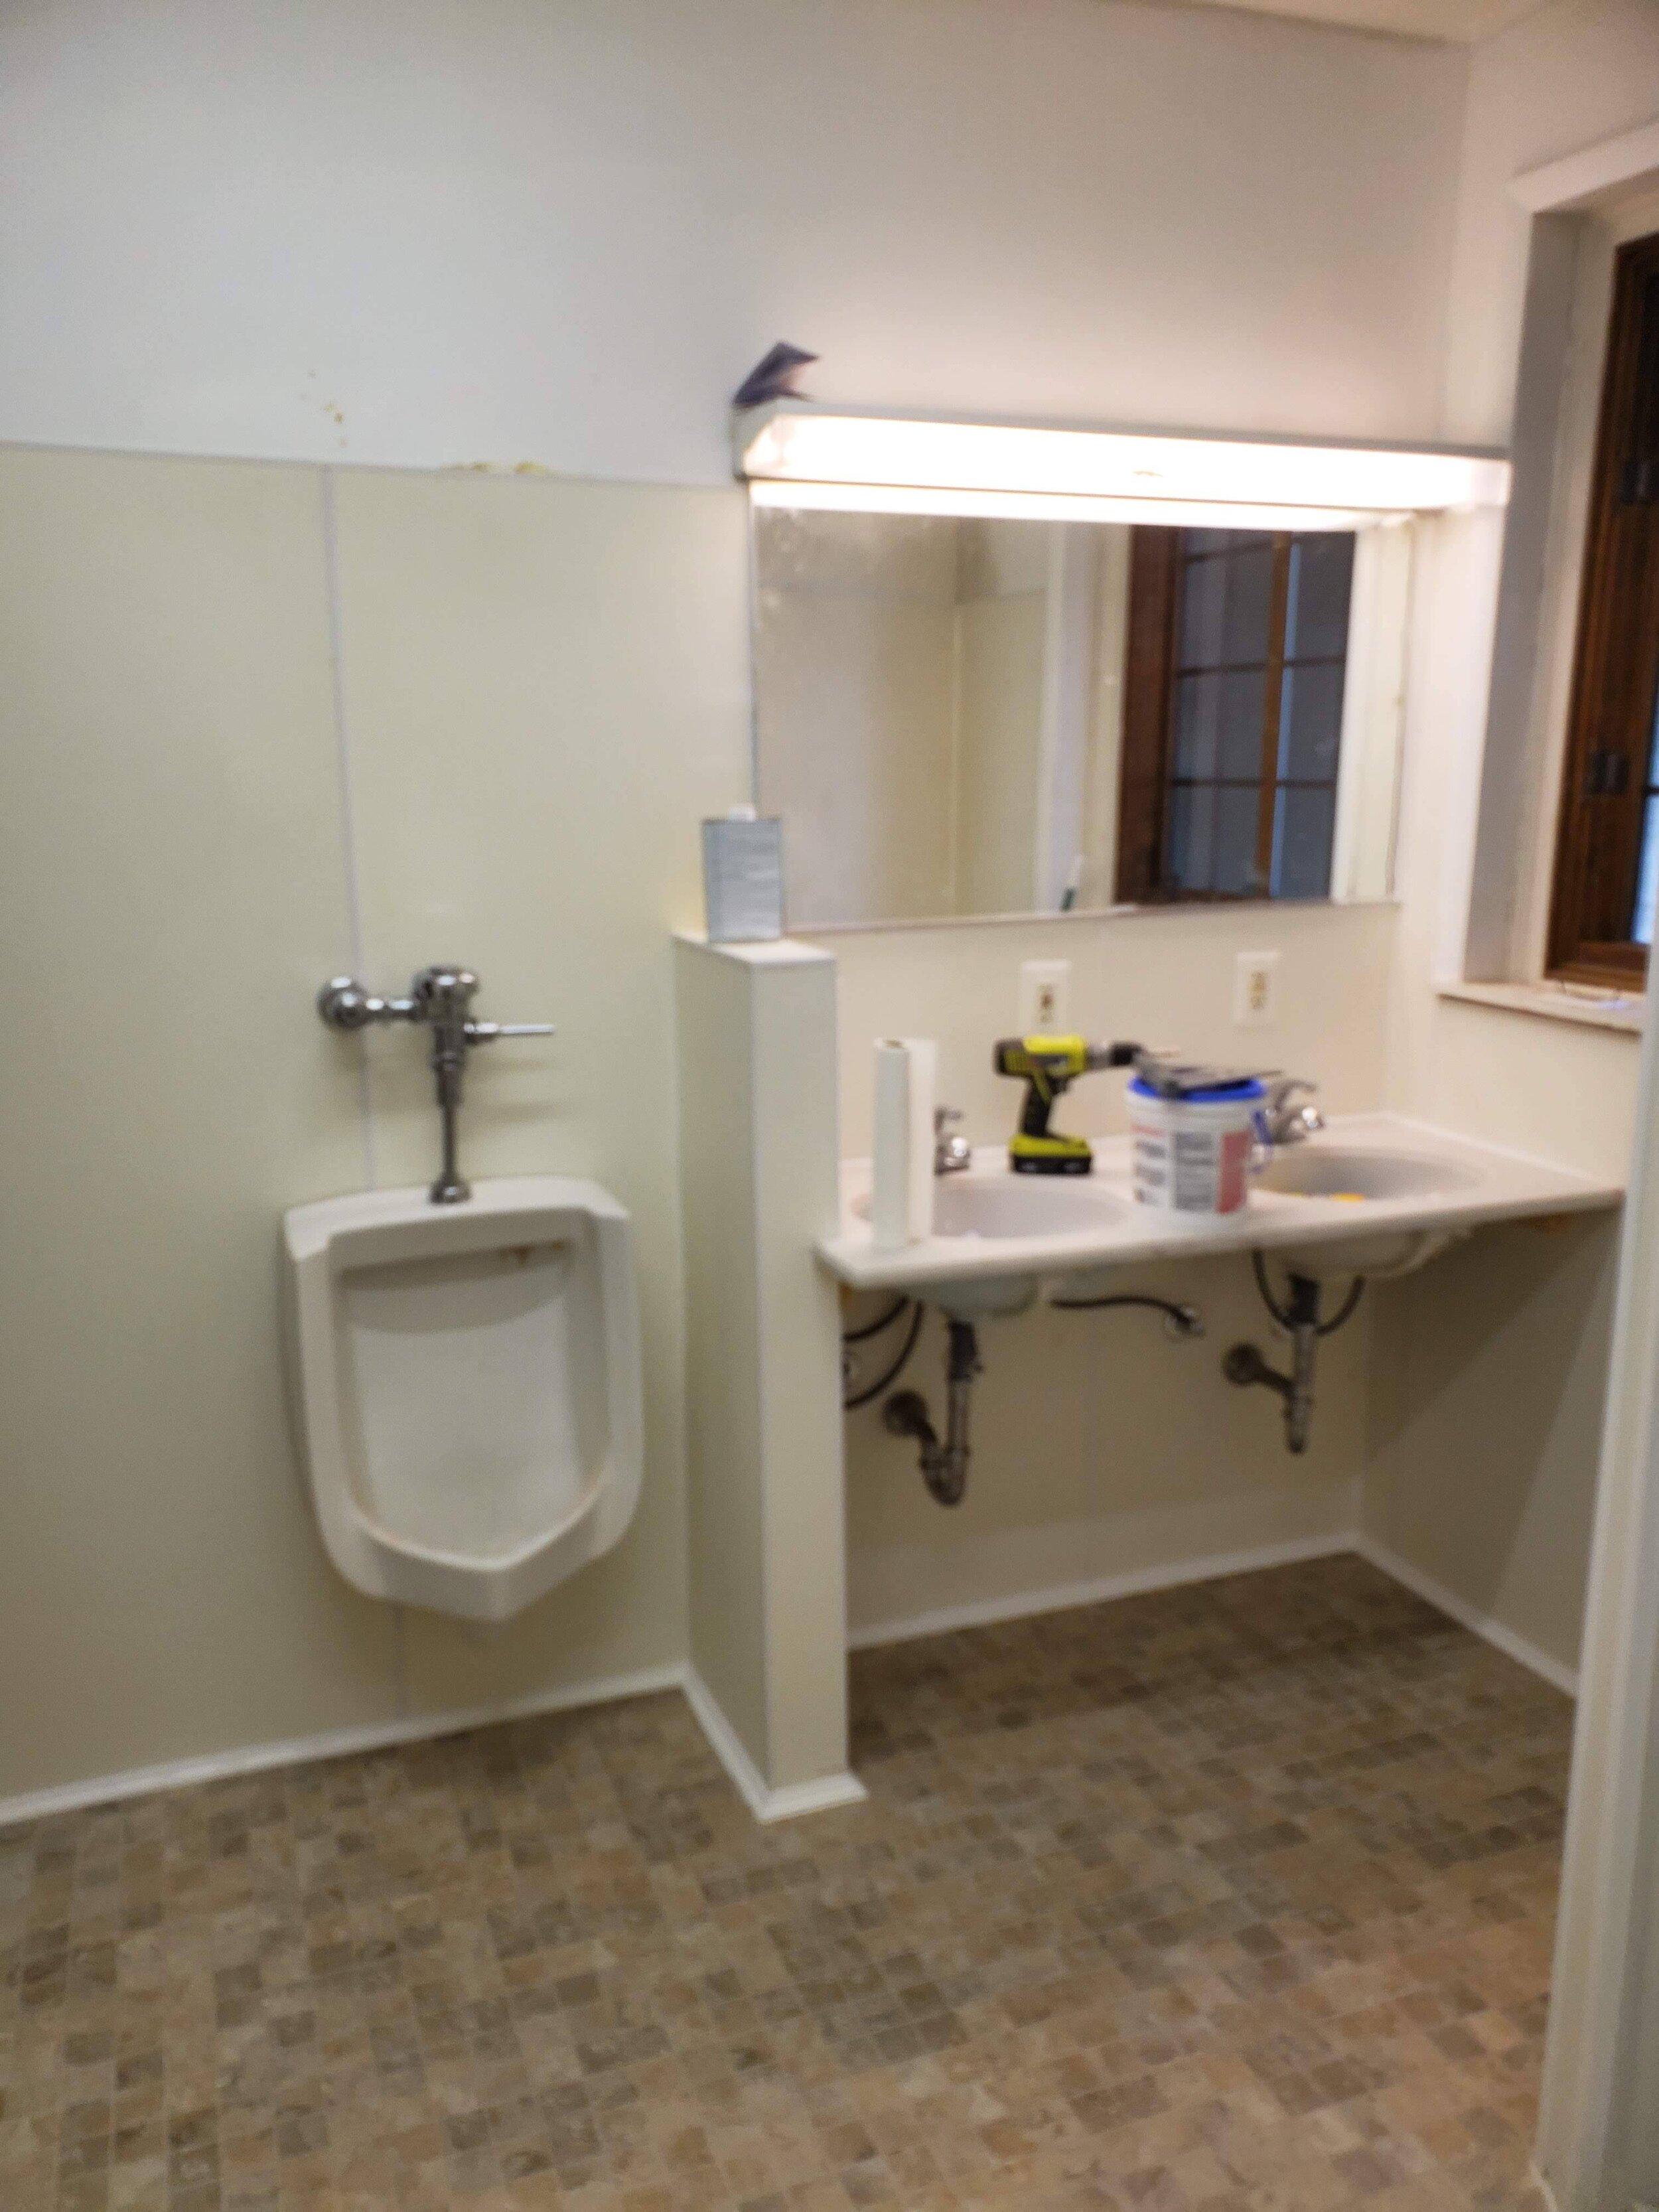 2019 First Floor Bathroom Renovation 20190818_111044.jpg